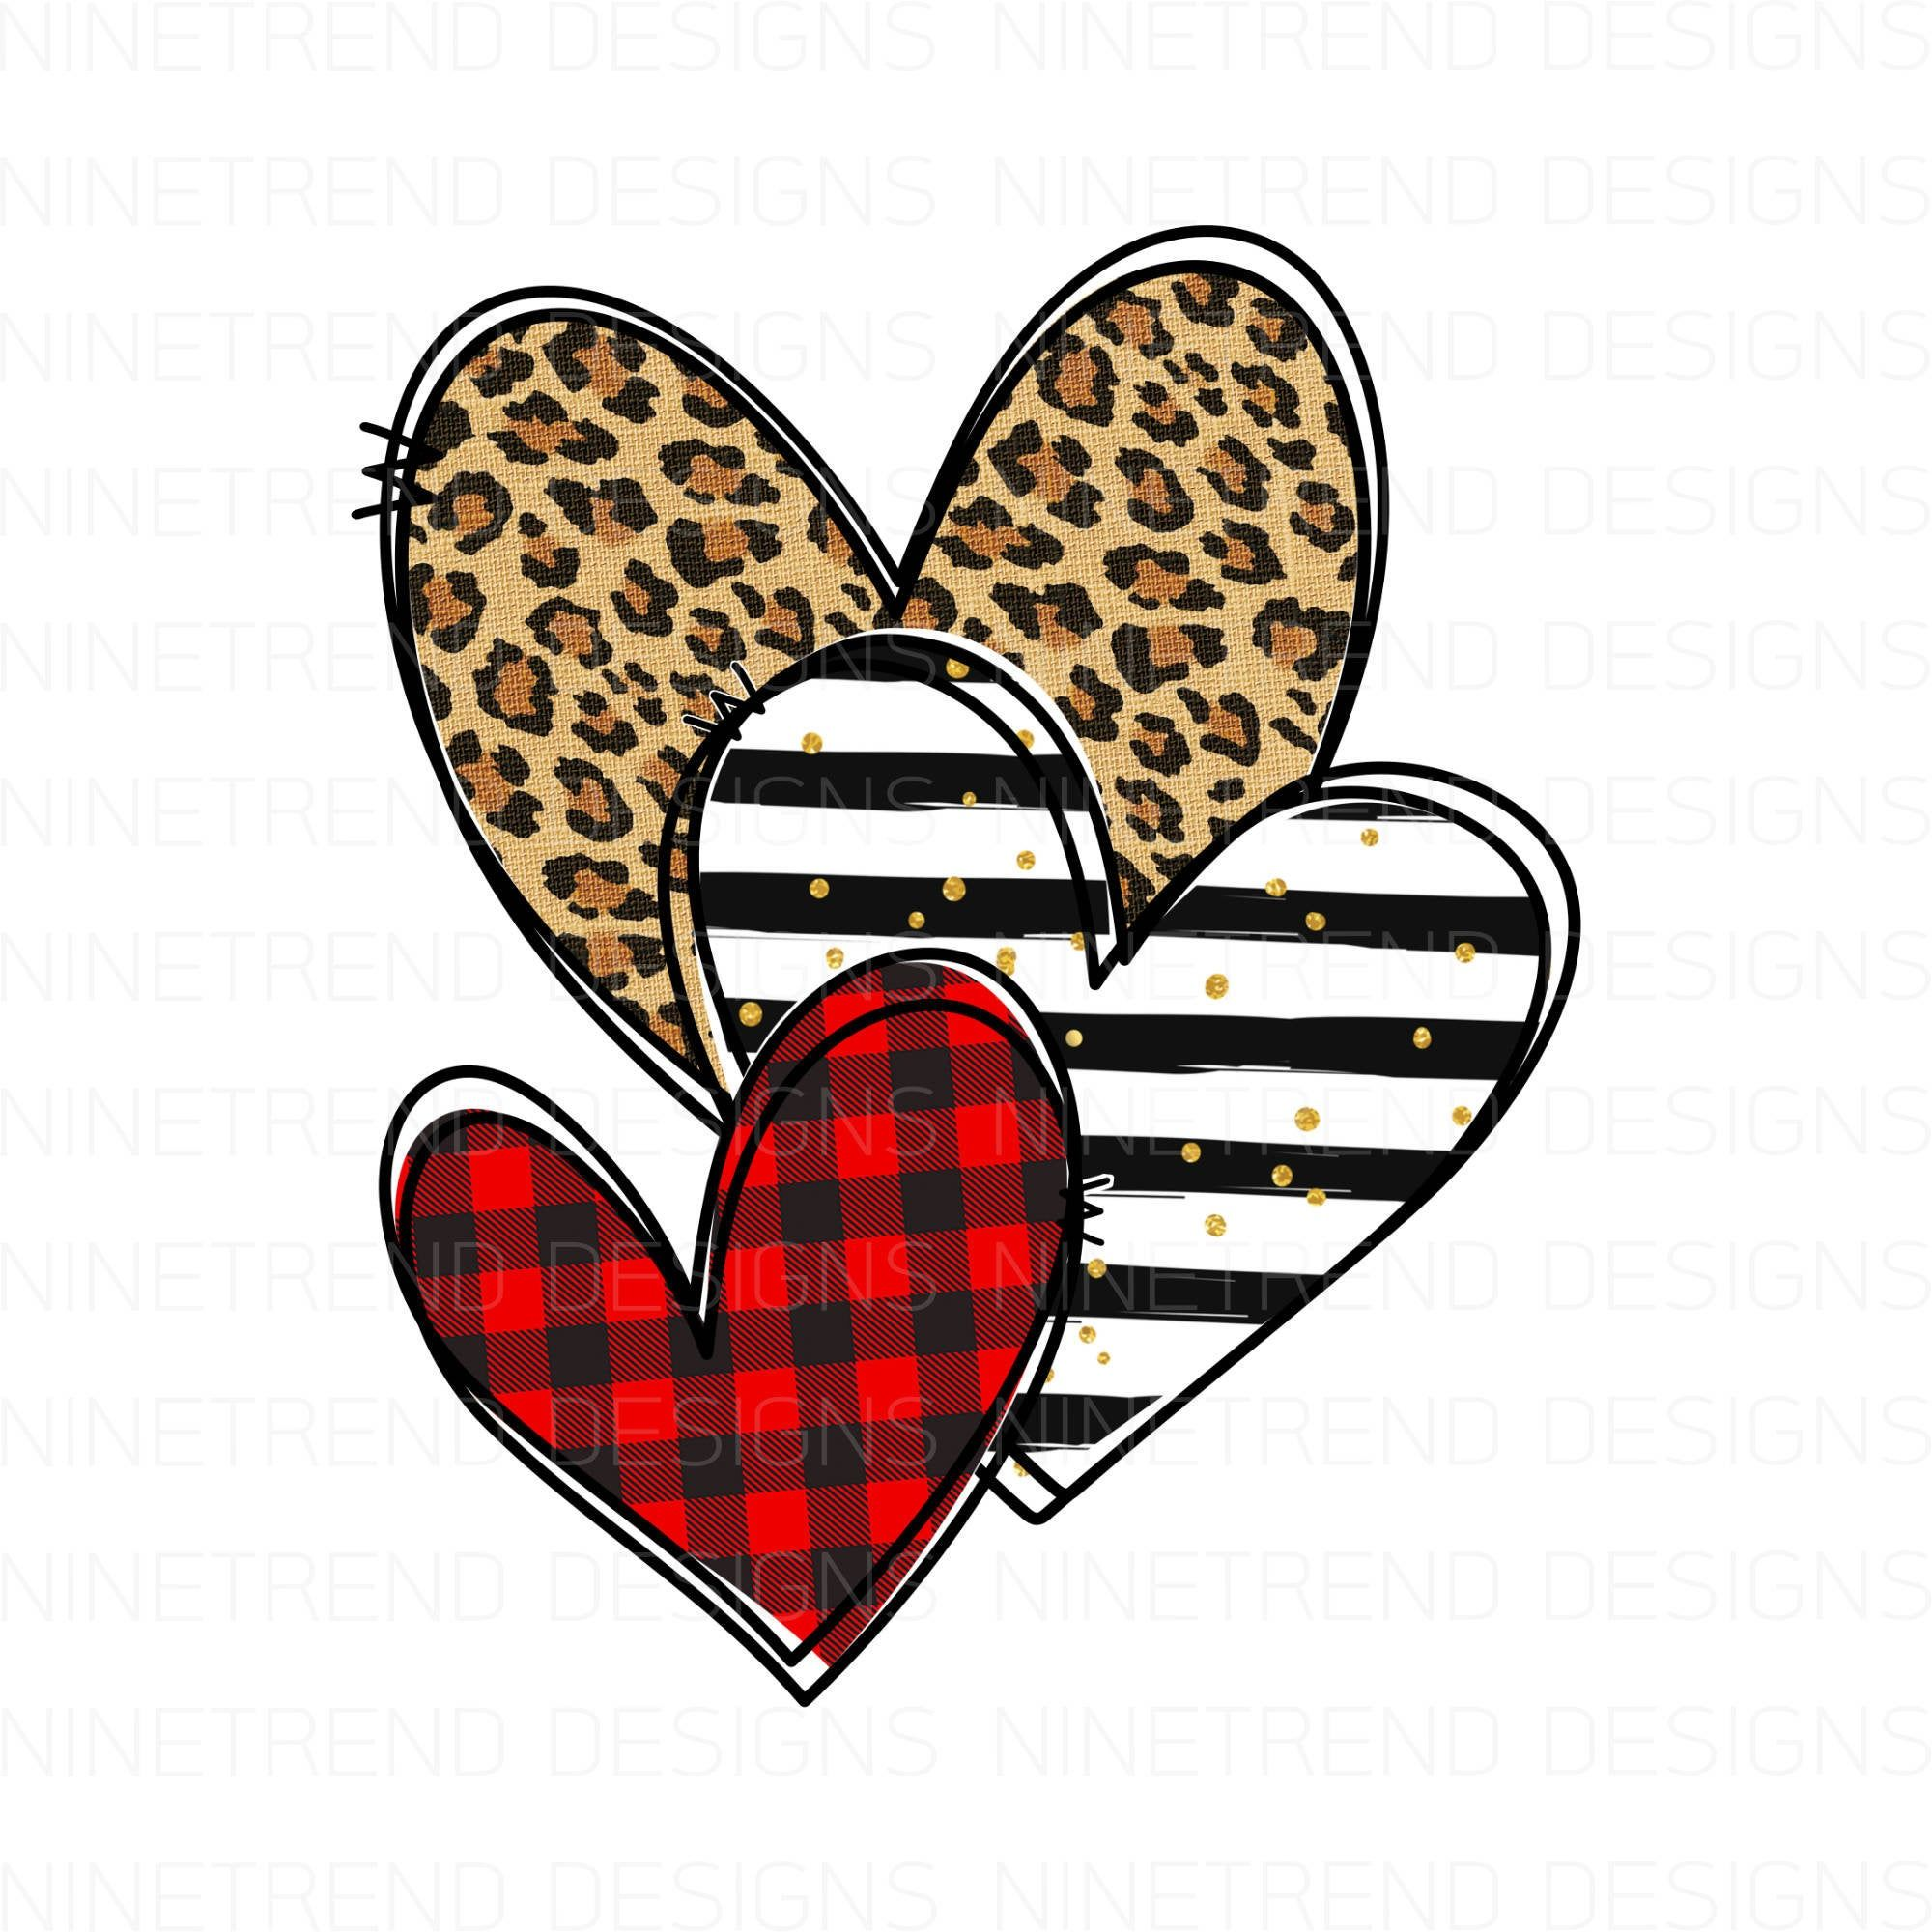 Leopard Plaid Stripe Hearts Png Sublimation Designs Downloads Digital Download Sublimation Graphics Printable Clip Art Valentines Wallpaper Drip Art Art Design